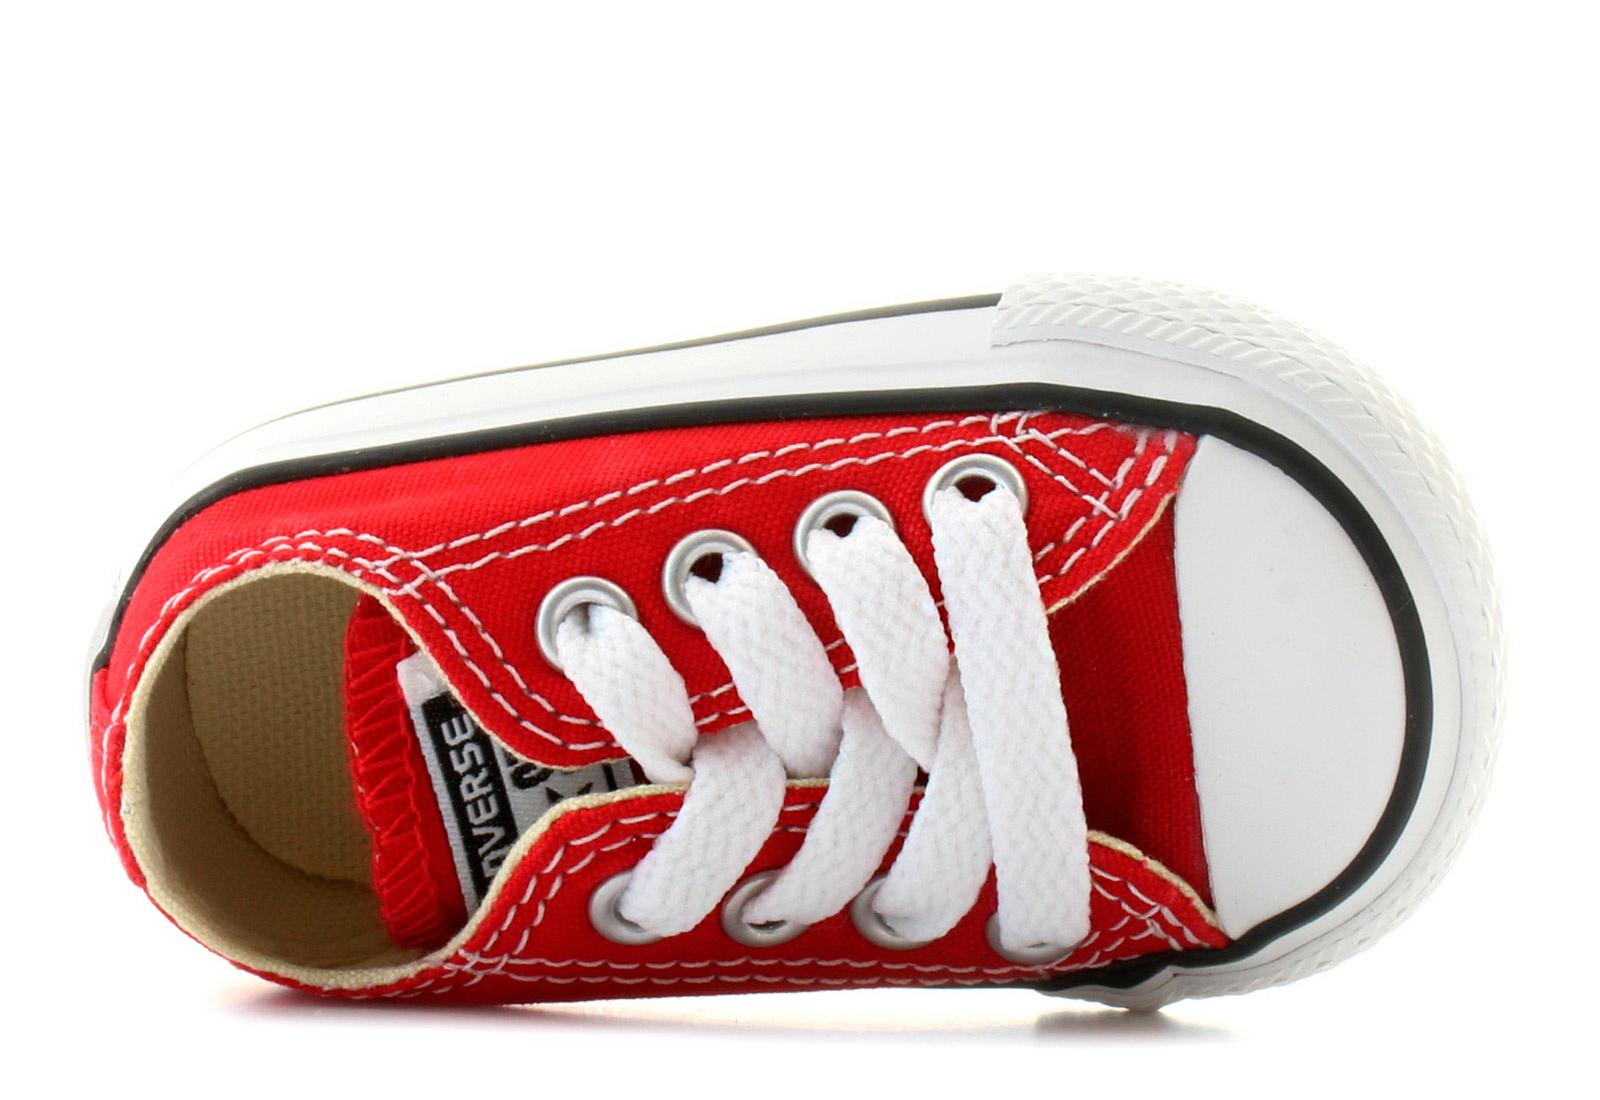 Converse Tornacipő - Ct As Kids Core Ox - 7J236C - Office Shoes ... 27f5b938a9